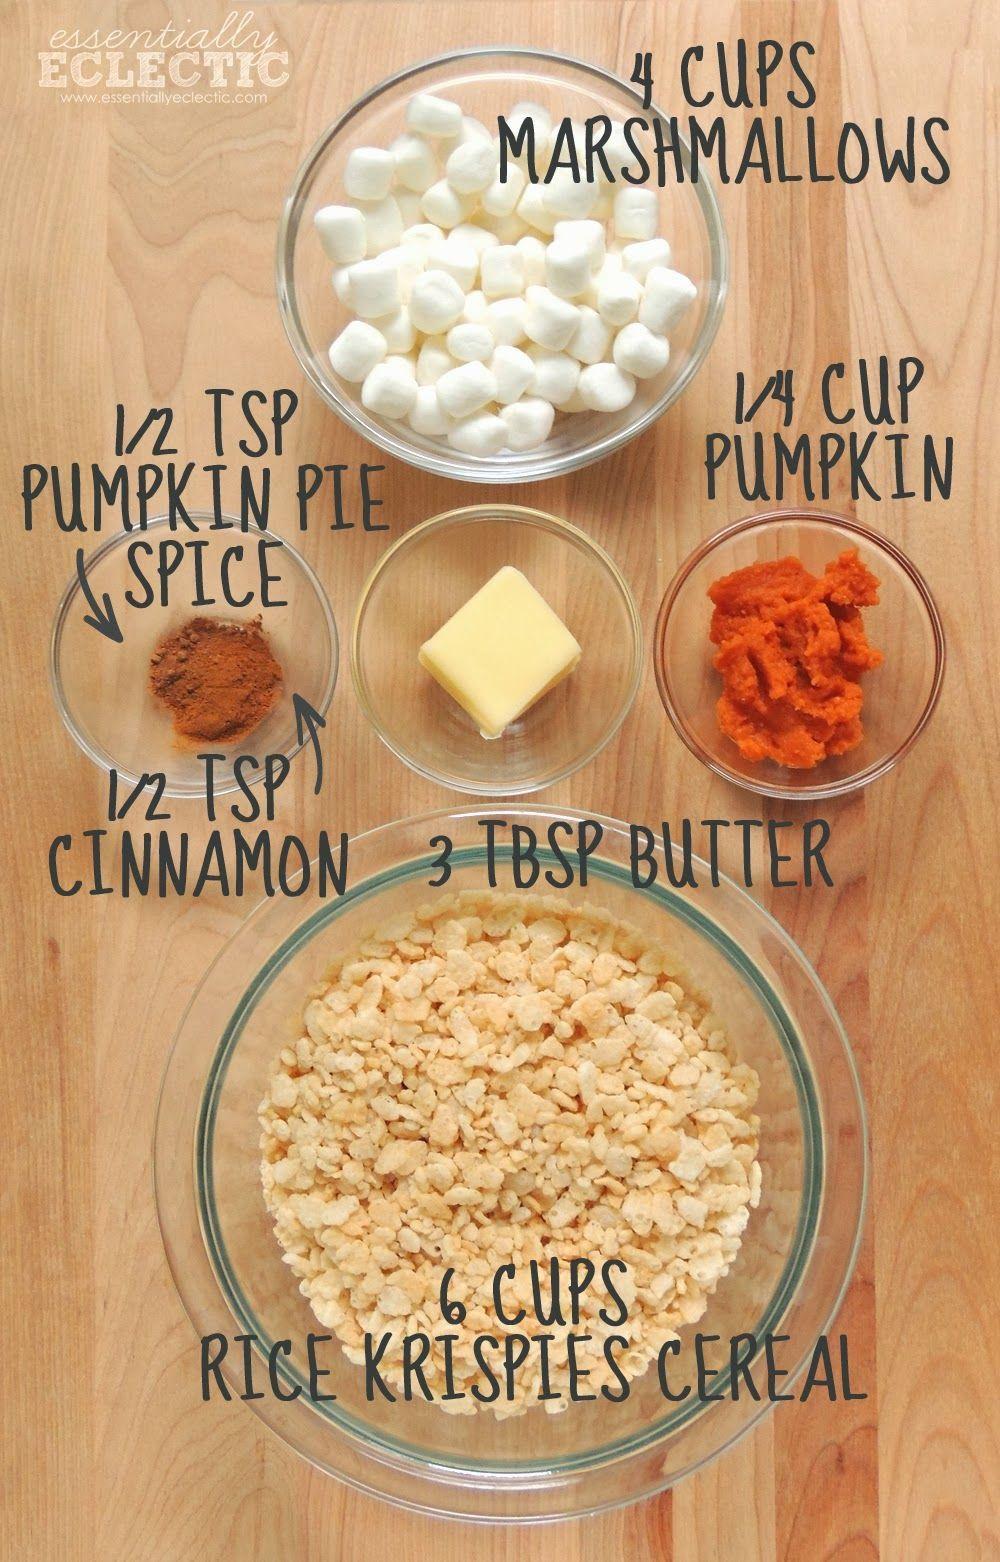 Spice Krispie Treats: A Festive Dessert in 10 Minutes Pumpkin Spice Rice Krispie Treats - make with GF crispy rice cereal for easy gluten-free recipe!Pumpkin Spice Rice Krispie Treats - make with GF crispy rice cereal for easy gluten-free recipe!